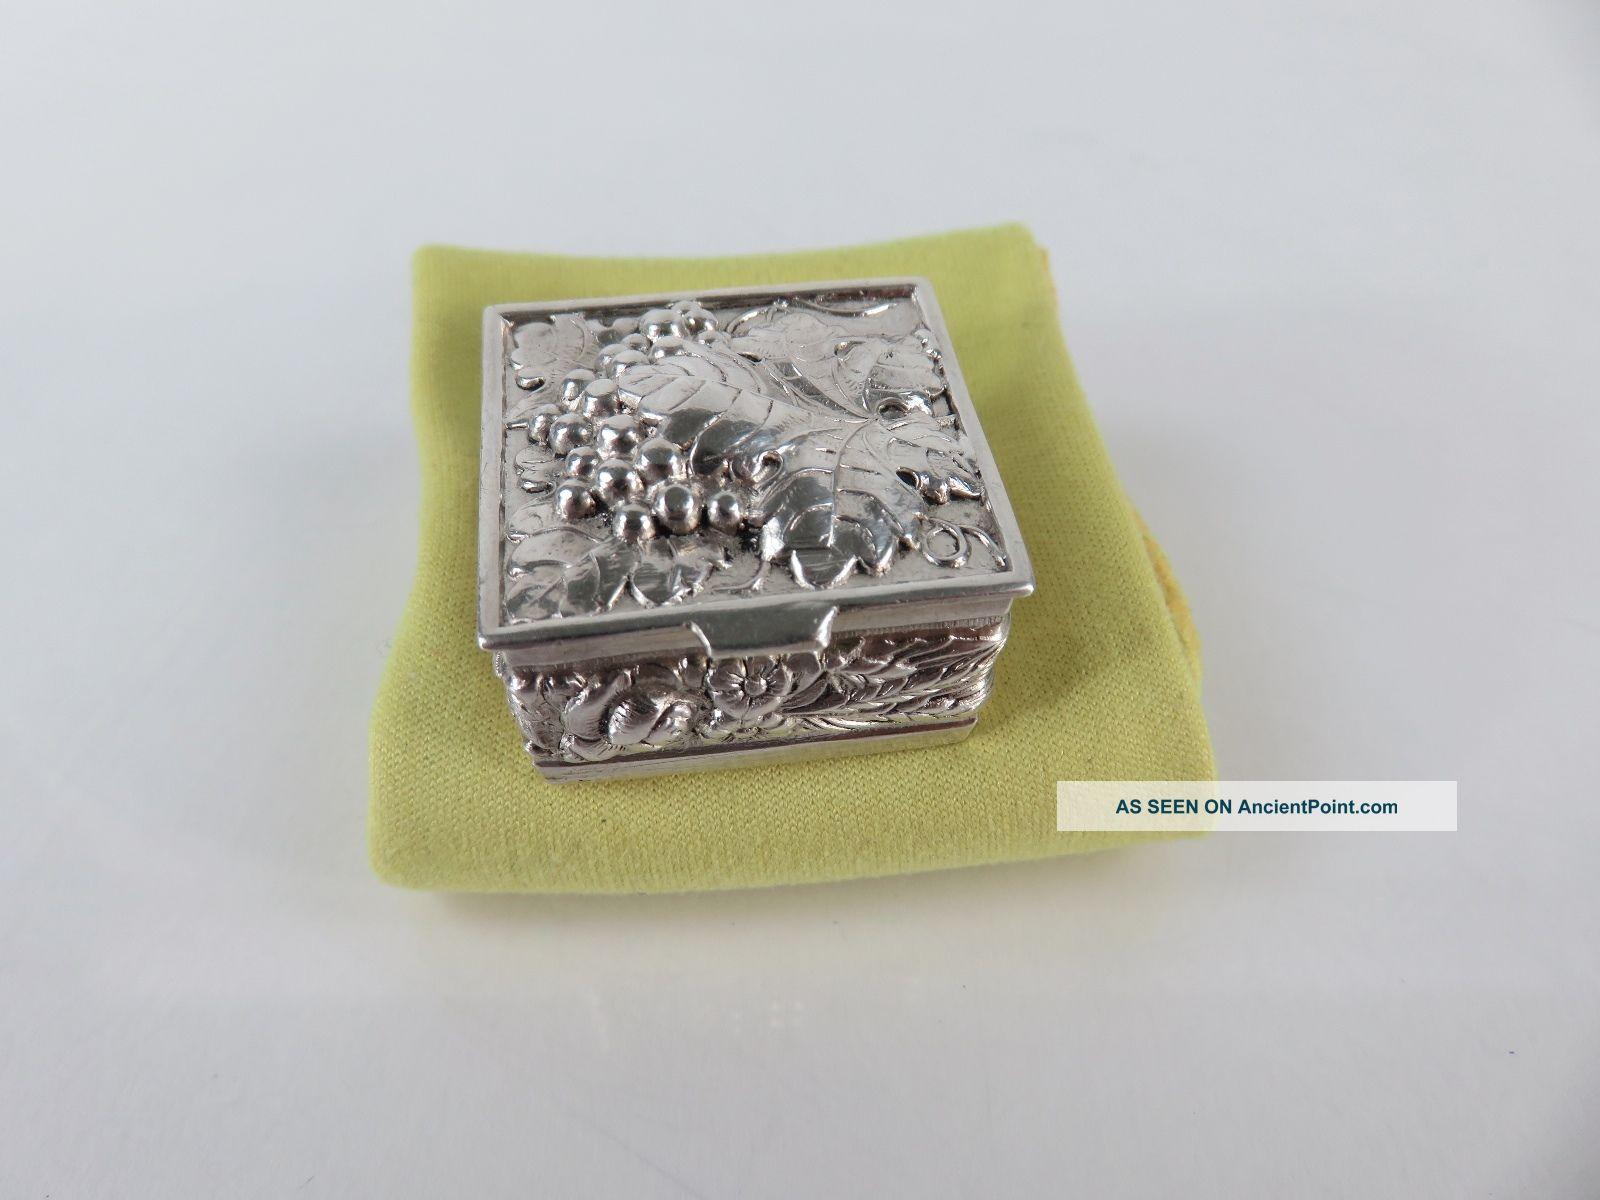 Vintage Sterling Silver Leafy Grape Repousse Pill Box Boxes photo